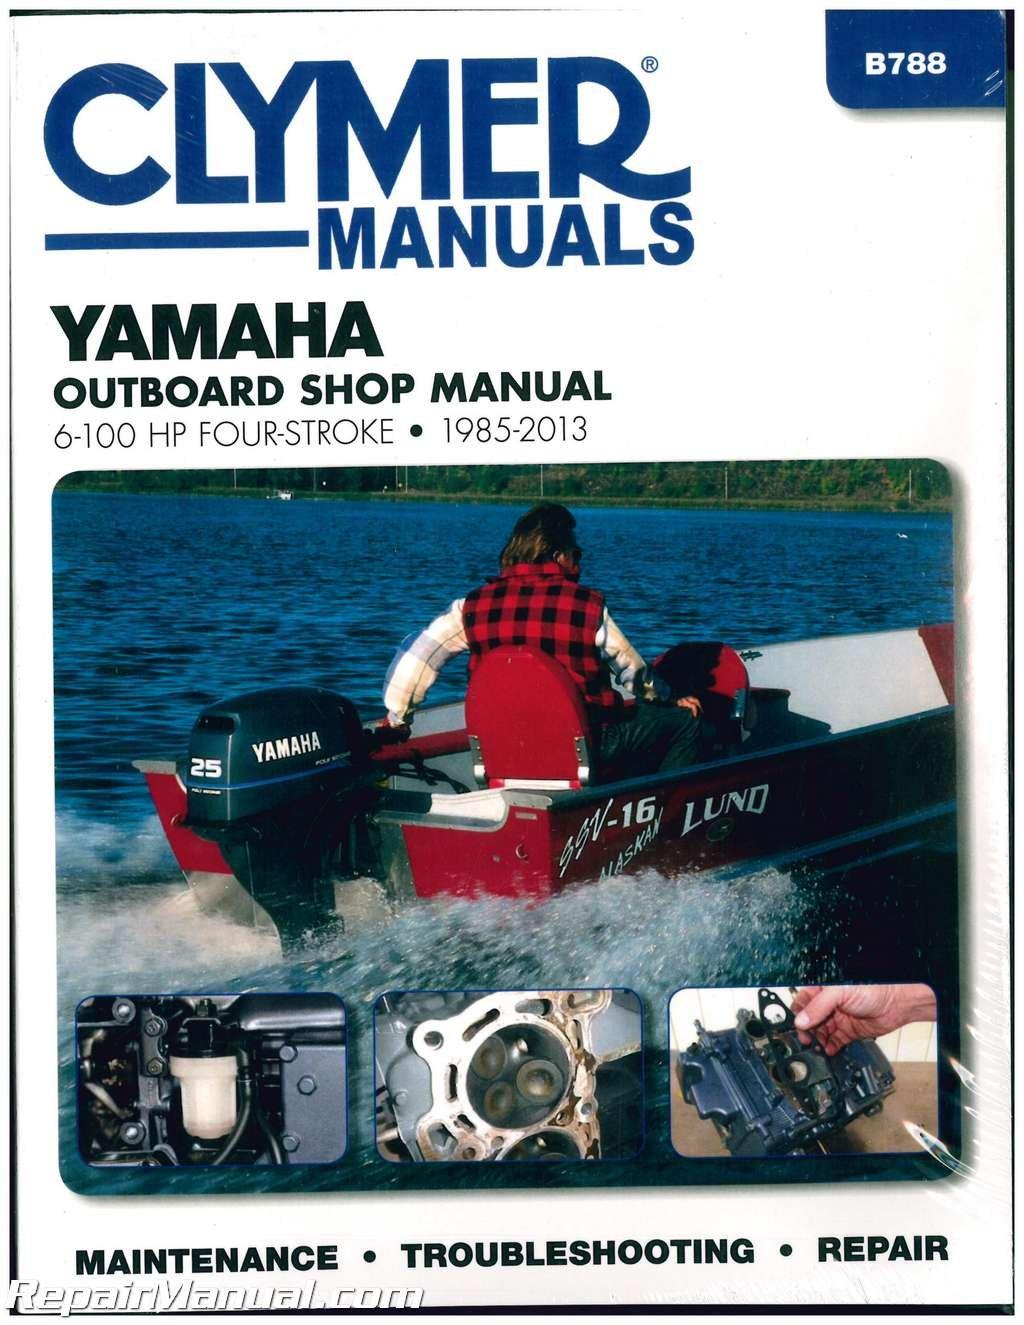 B788 Yamaha 6 -100hp Outboard Repair Manual 1985-2013 by ... on